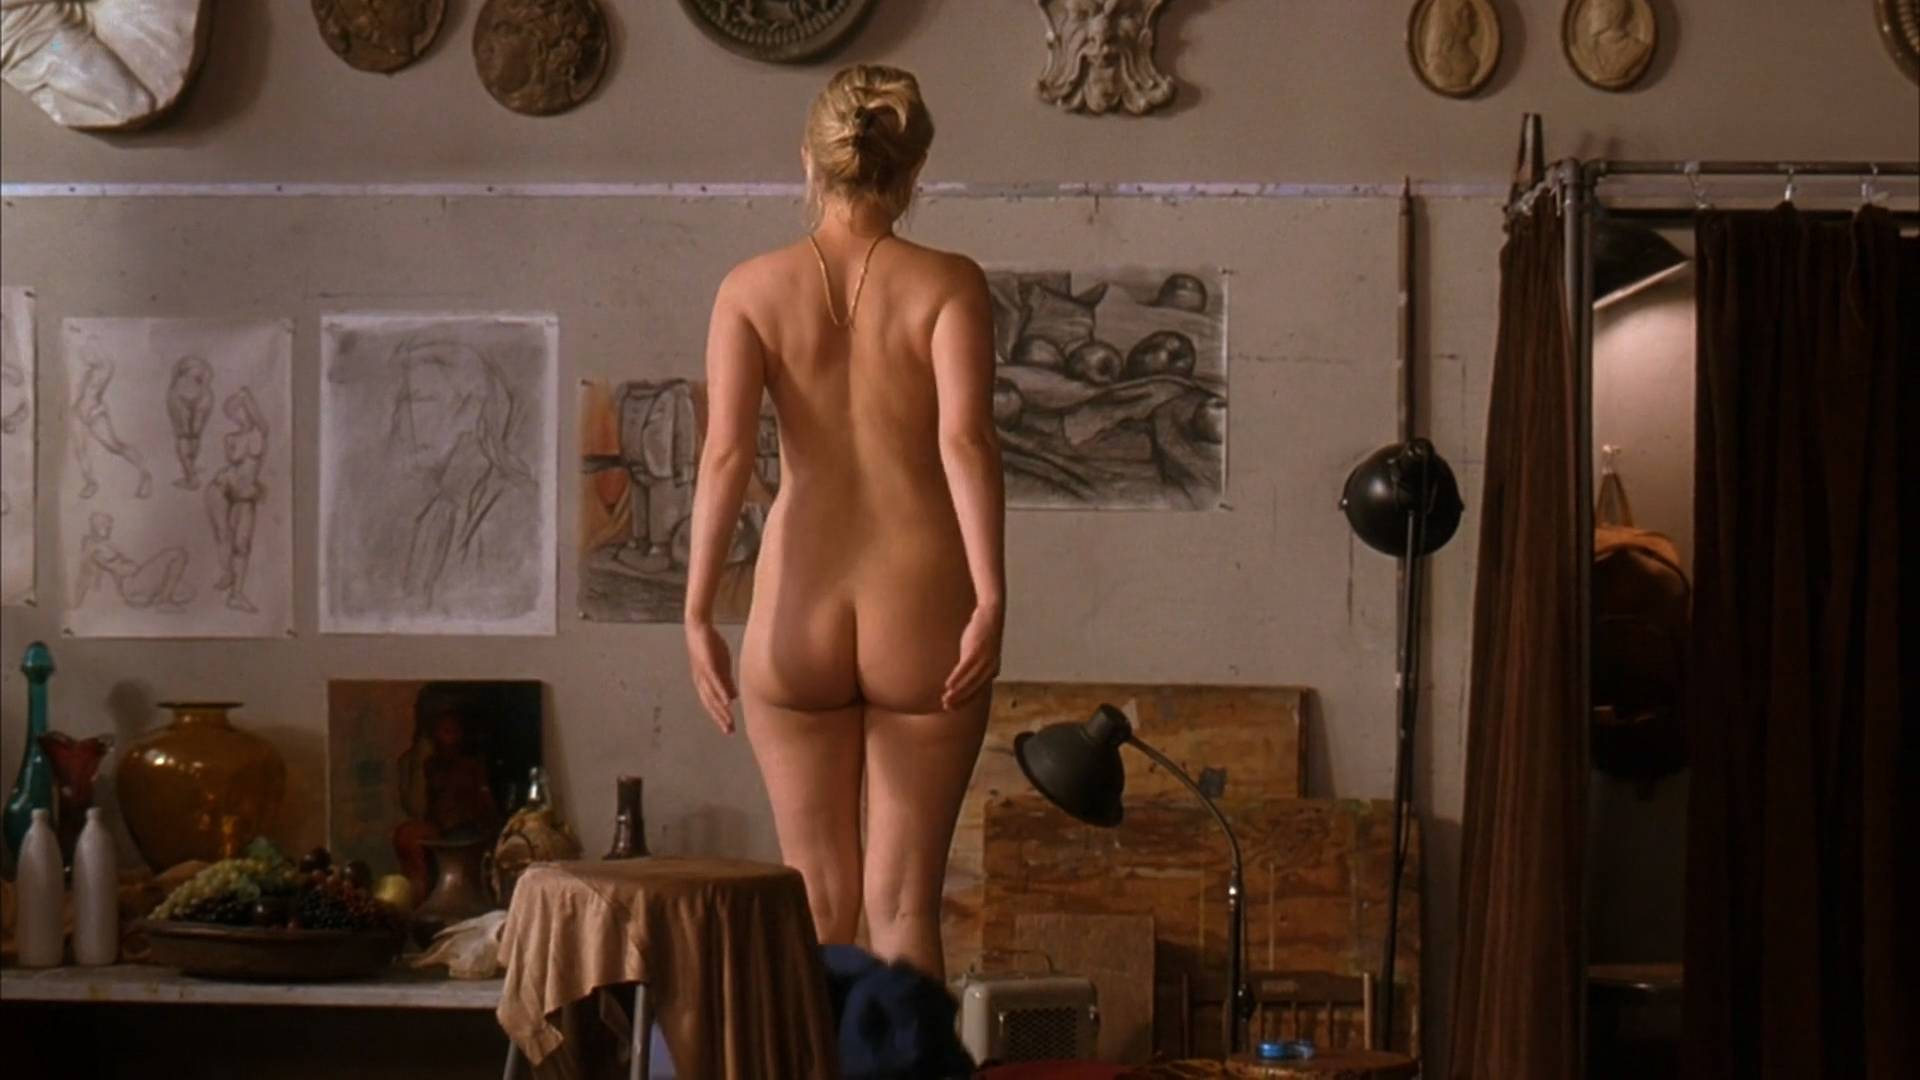 Sophia myles nude the fappening